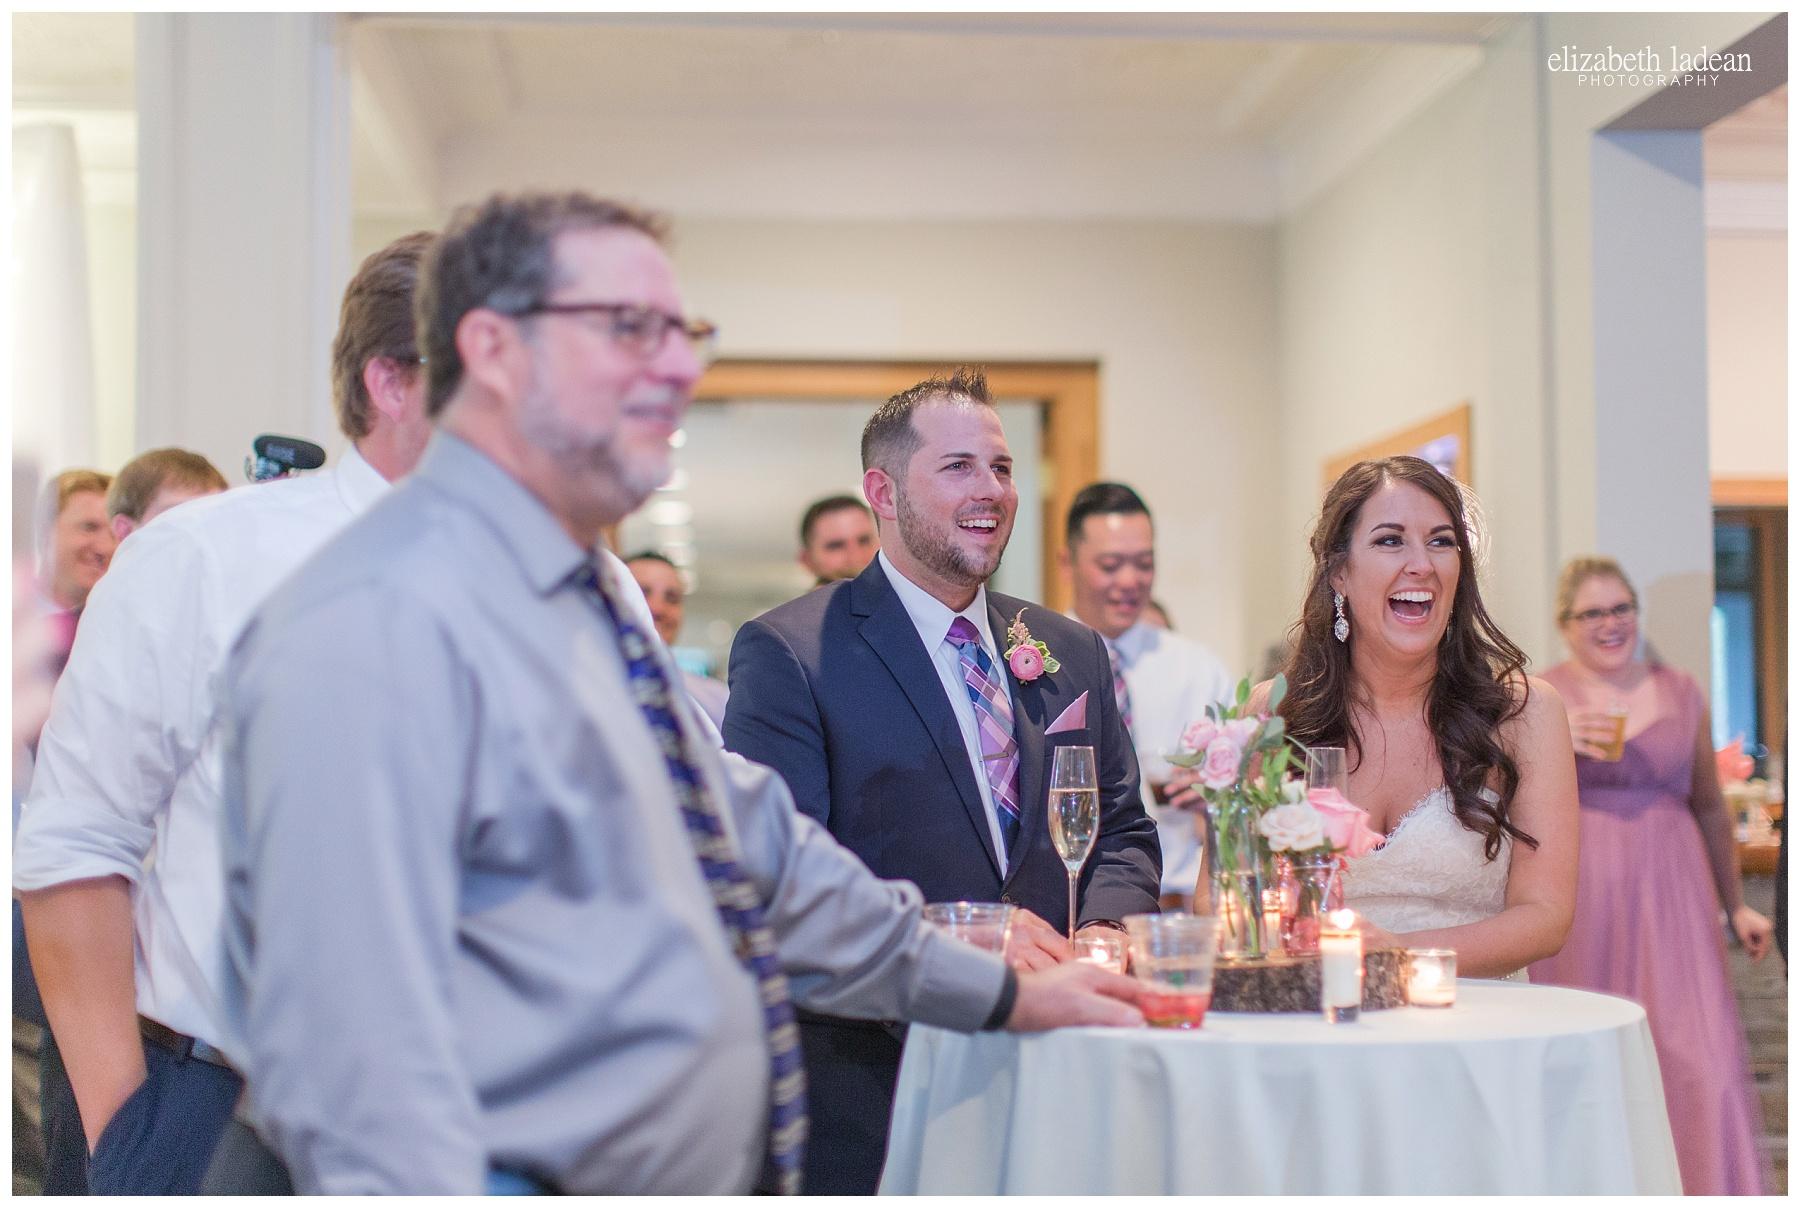 Hillcrest-Country-Club-Kansas-City-Wedding-Photography-E+J-0520-Elizabeth-Ladean-Photography-photo_0876.jpg